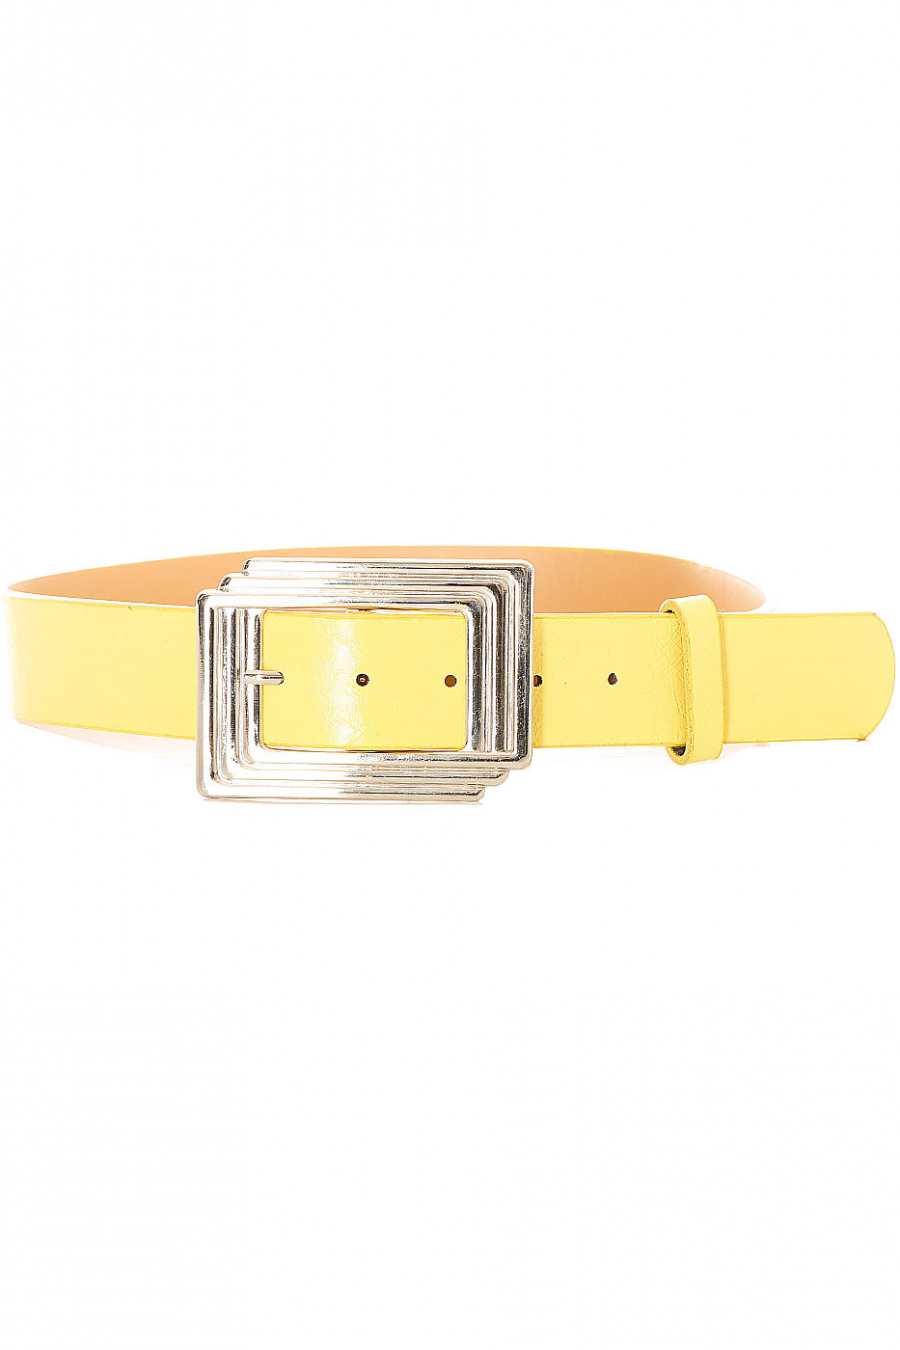 Women's belt in yellow with rectangular buckle. SG0218